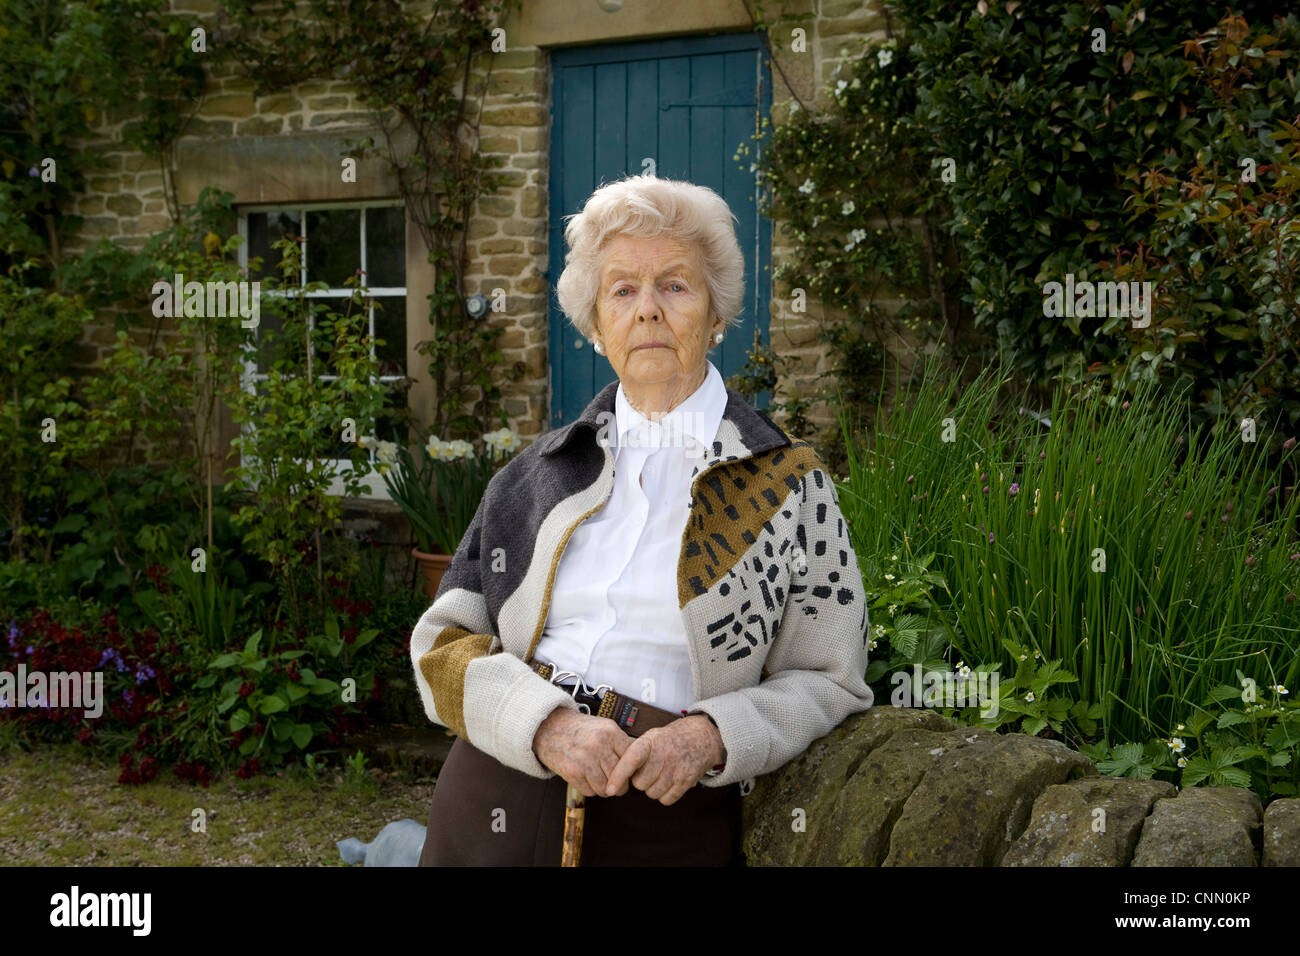 5/5/09 Edensor Derbyshire - Deborah,  Duchess of Devonshire at her home in Edensor - Stock Image